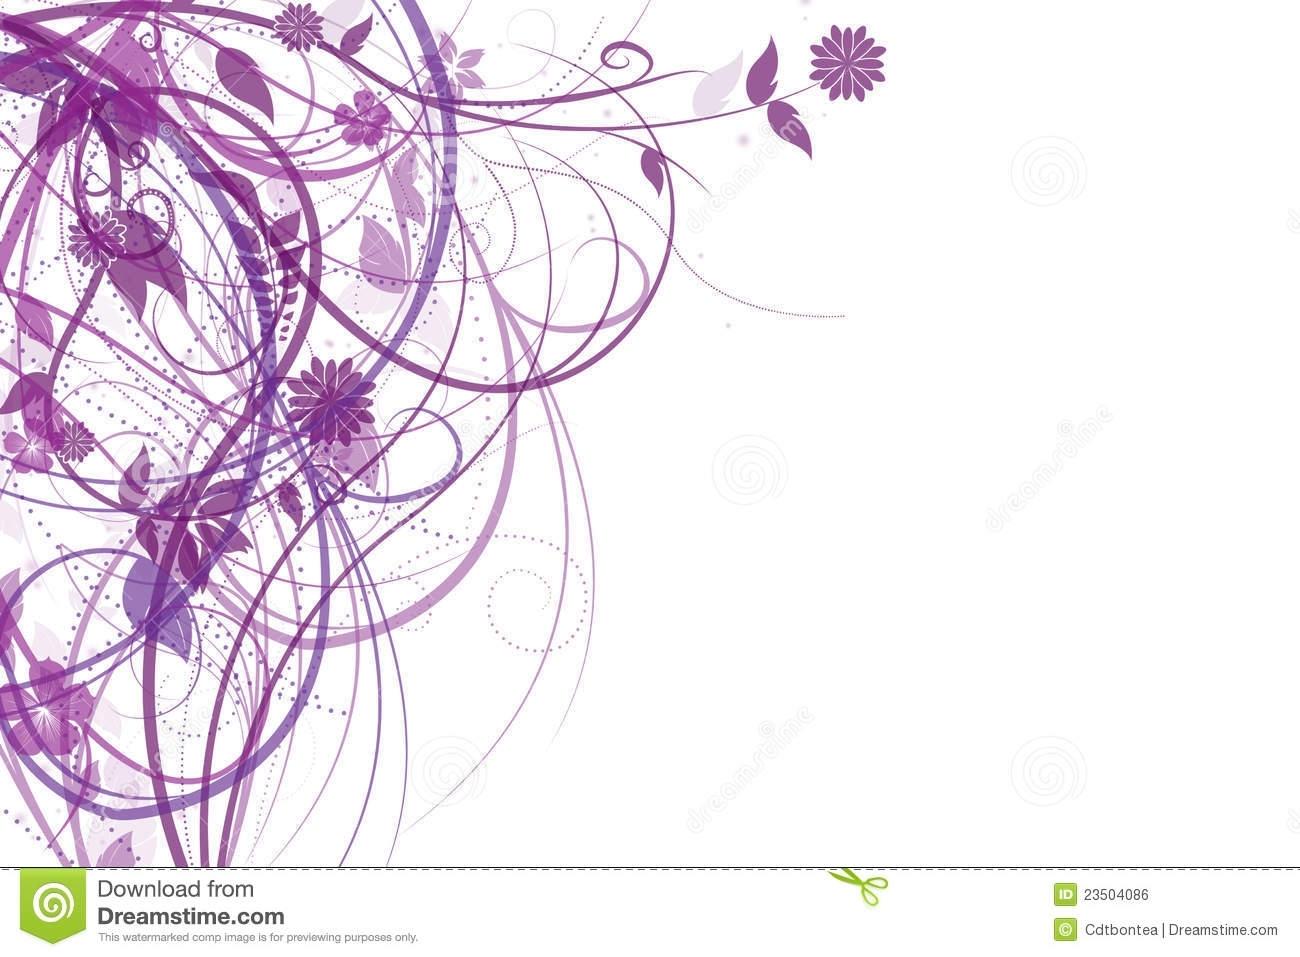 white background purple flower stock illustration - illustration of